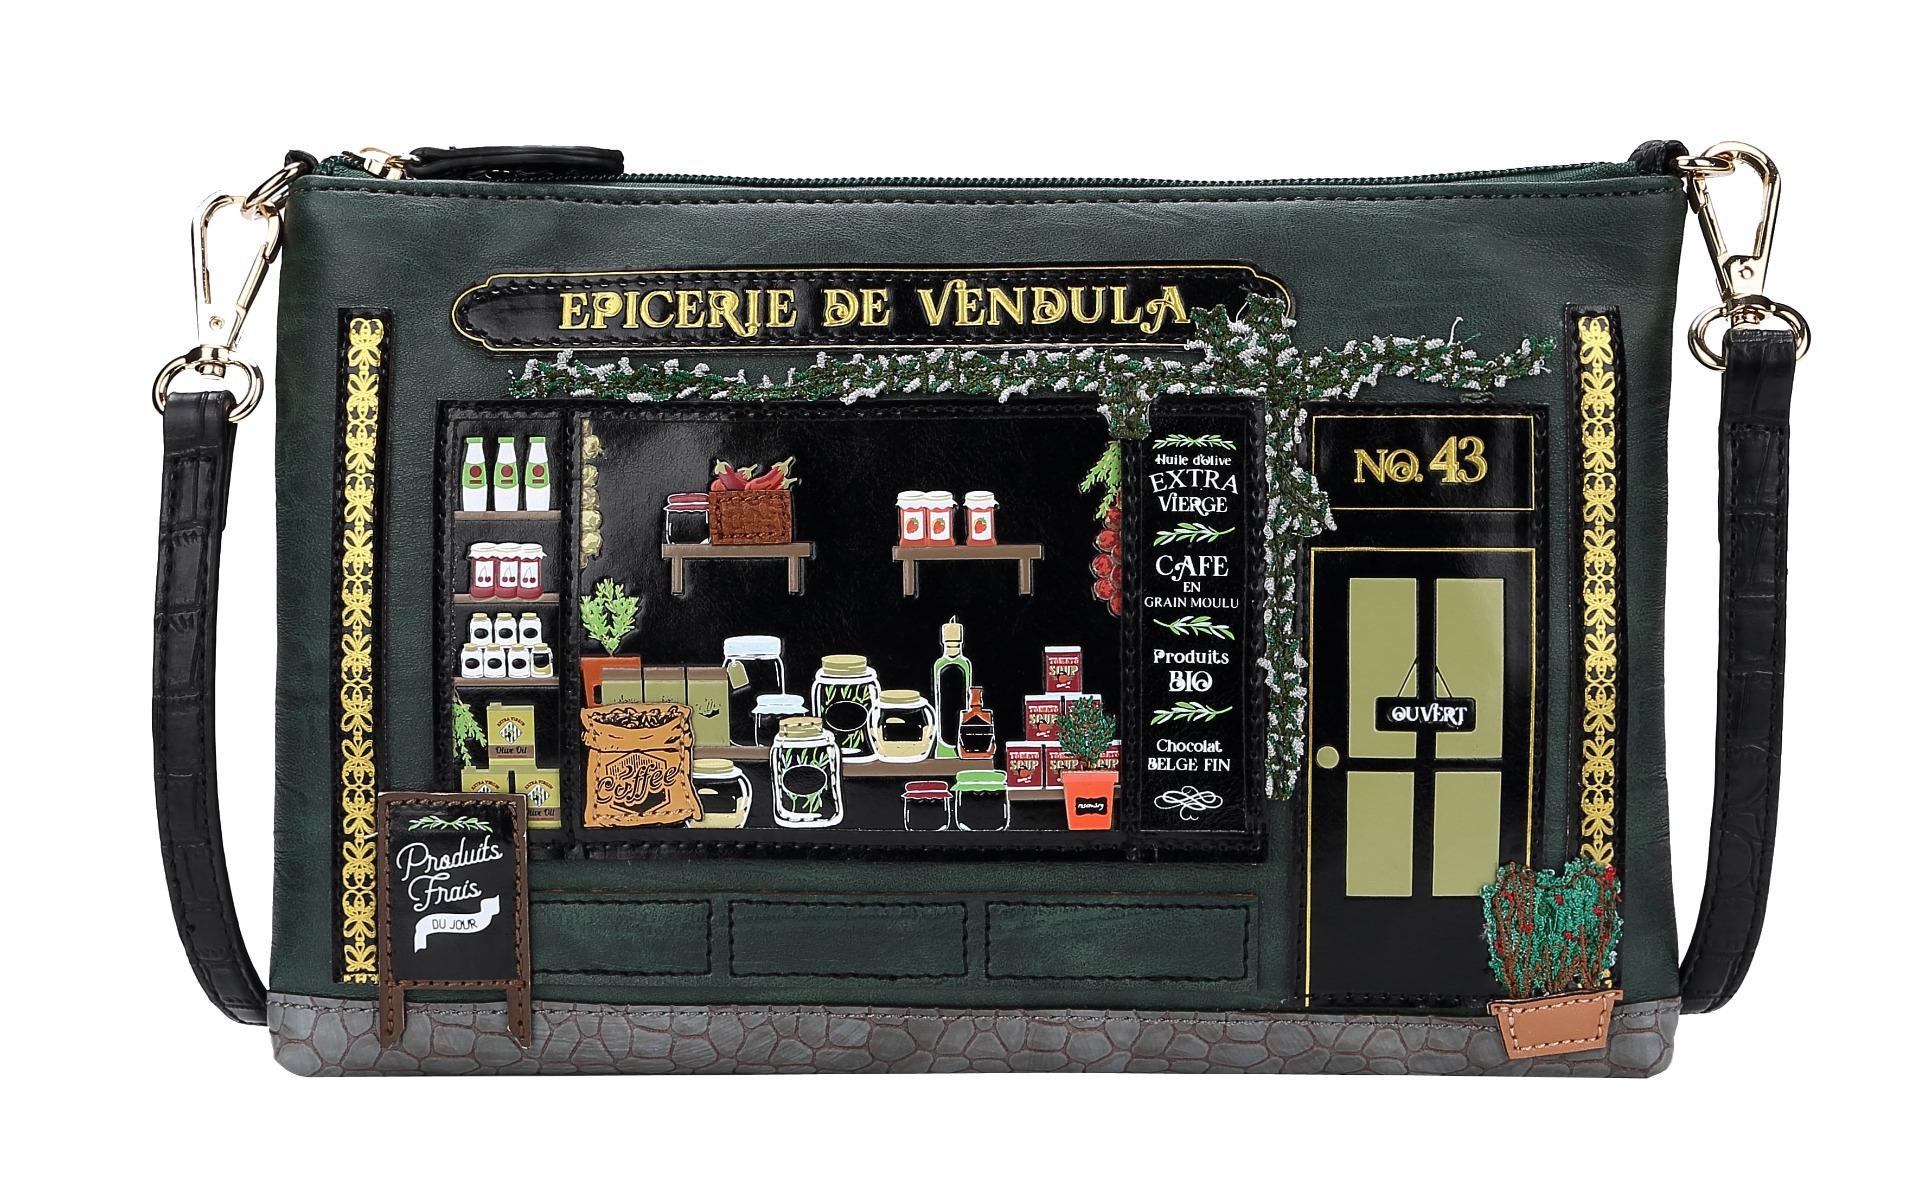 Bolso Clutch Epicerie de Vendula London